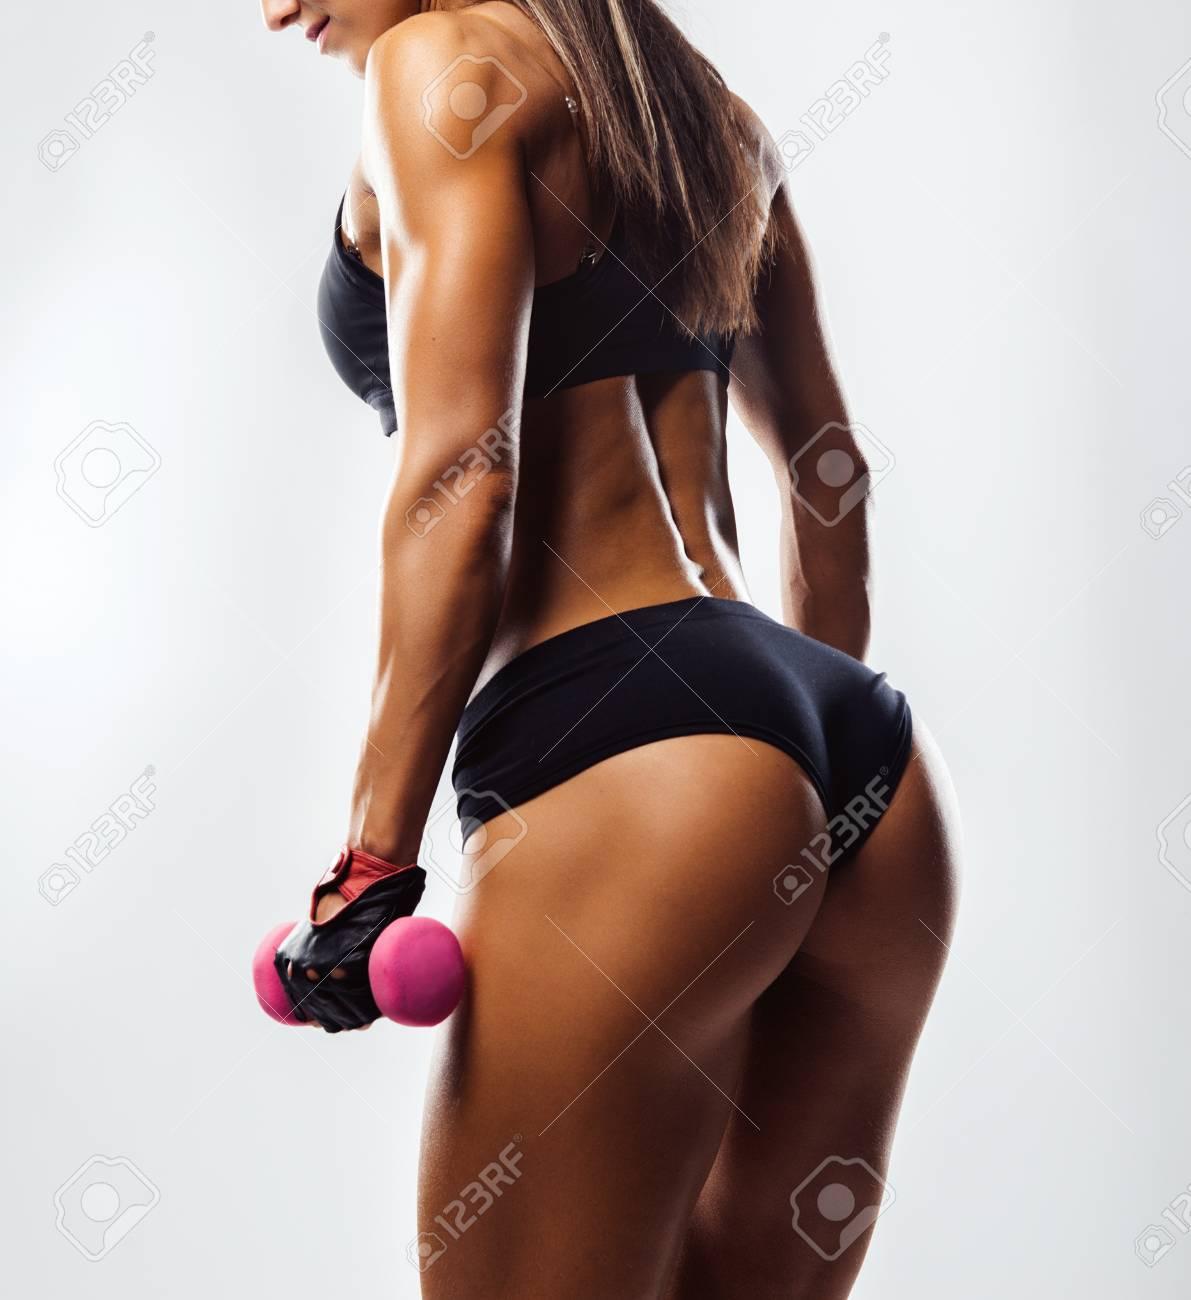 Sexy blow job naked